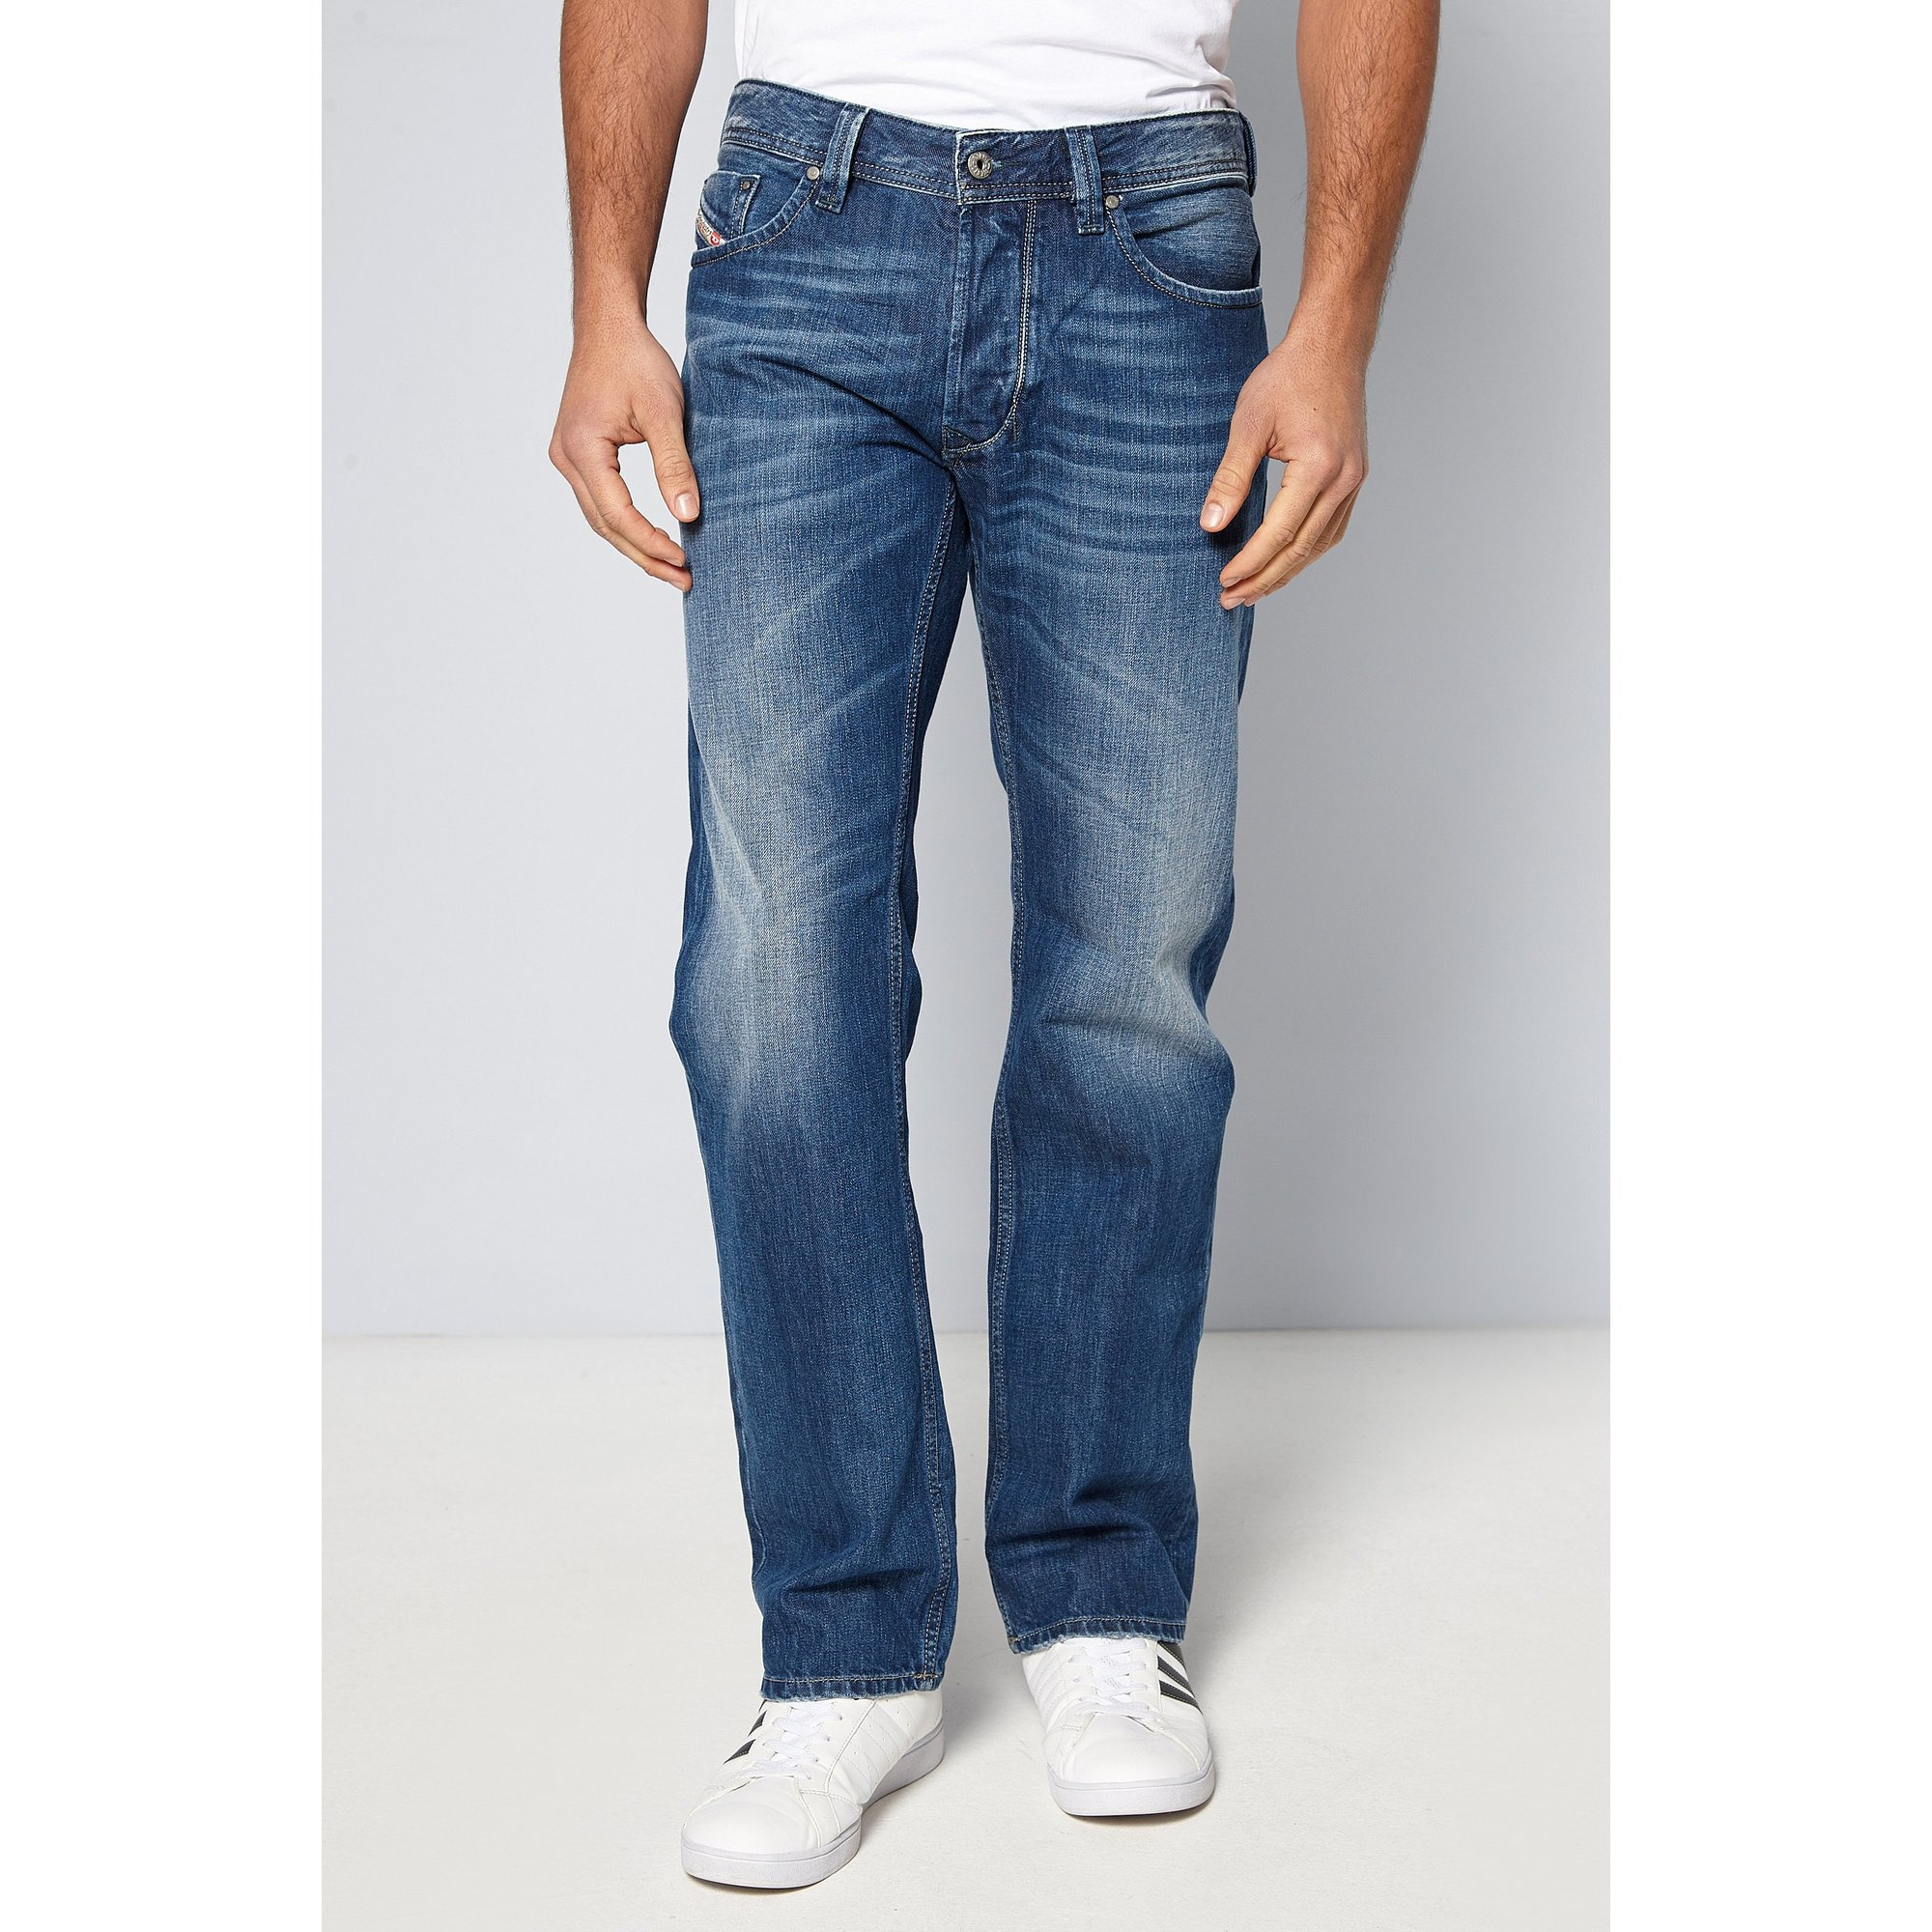 Image of Diesel Larkee Denim Jeans